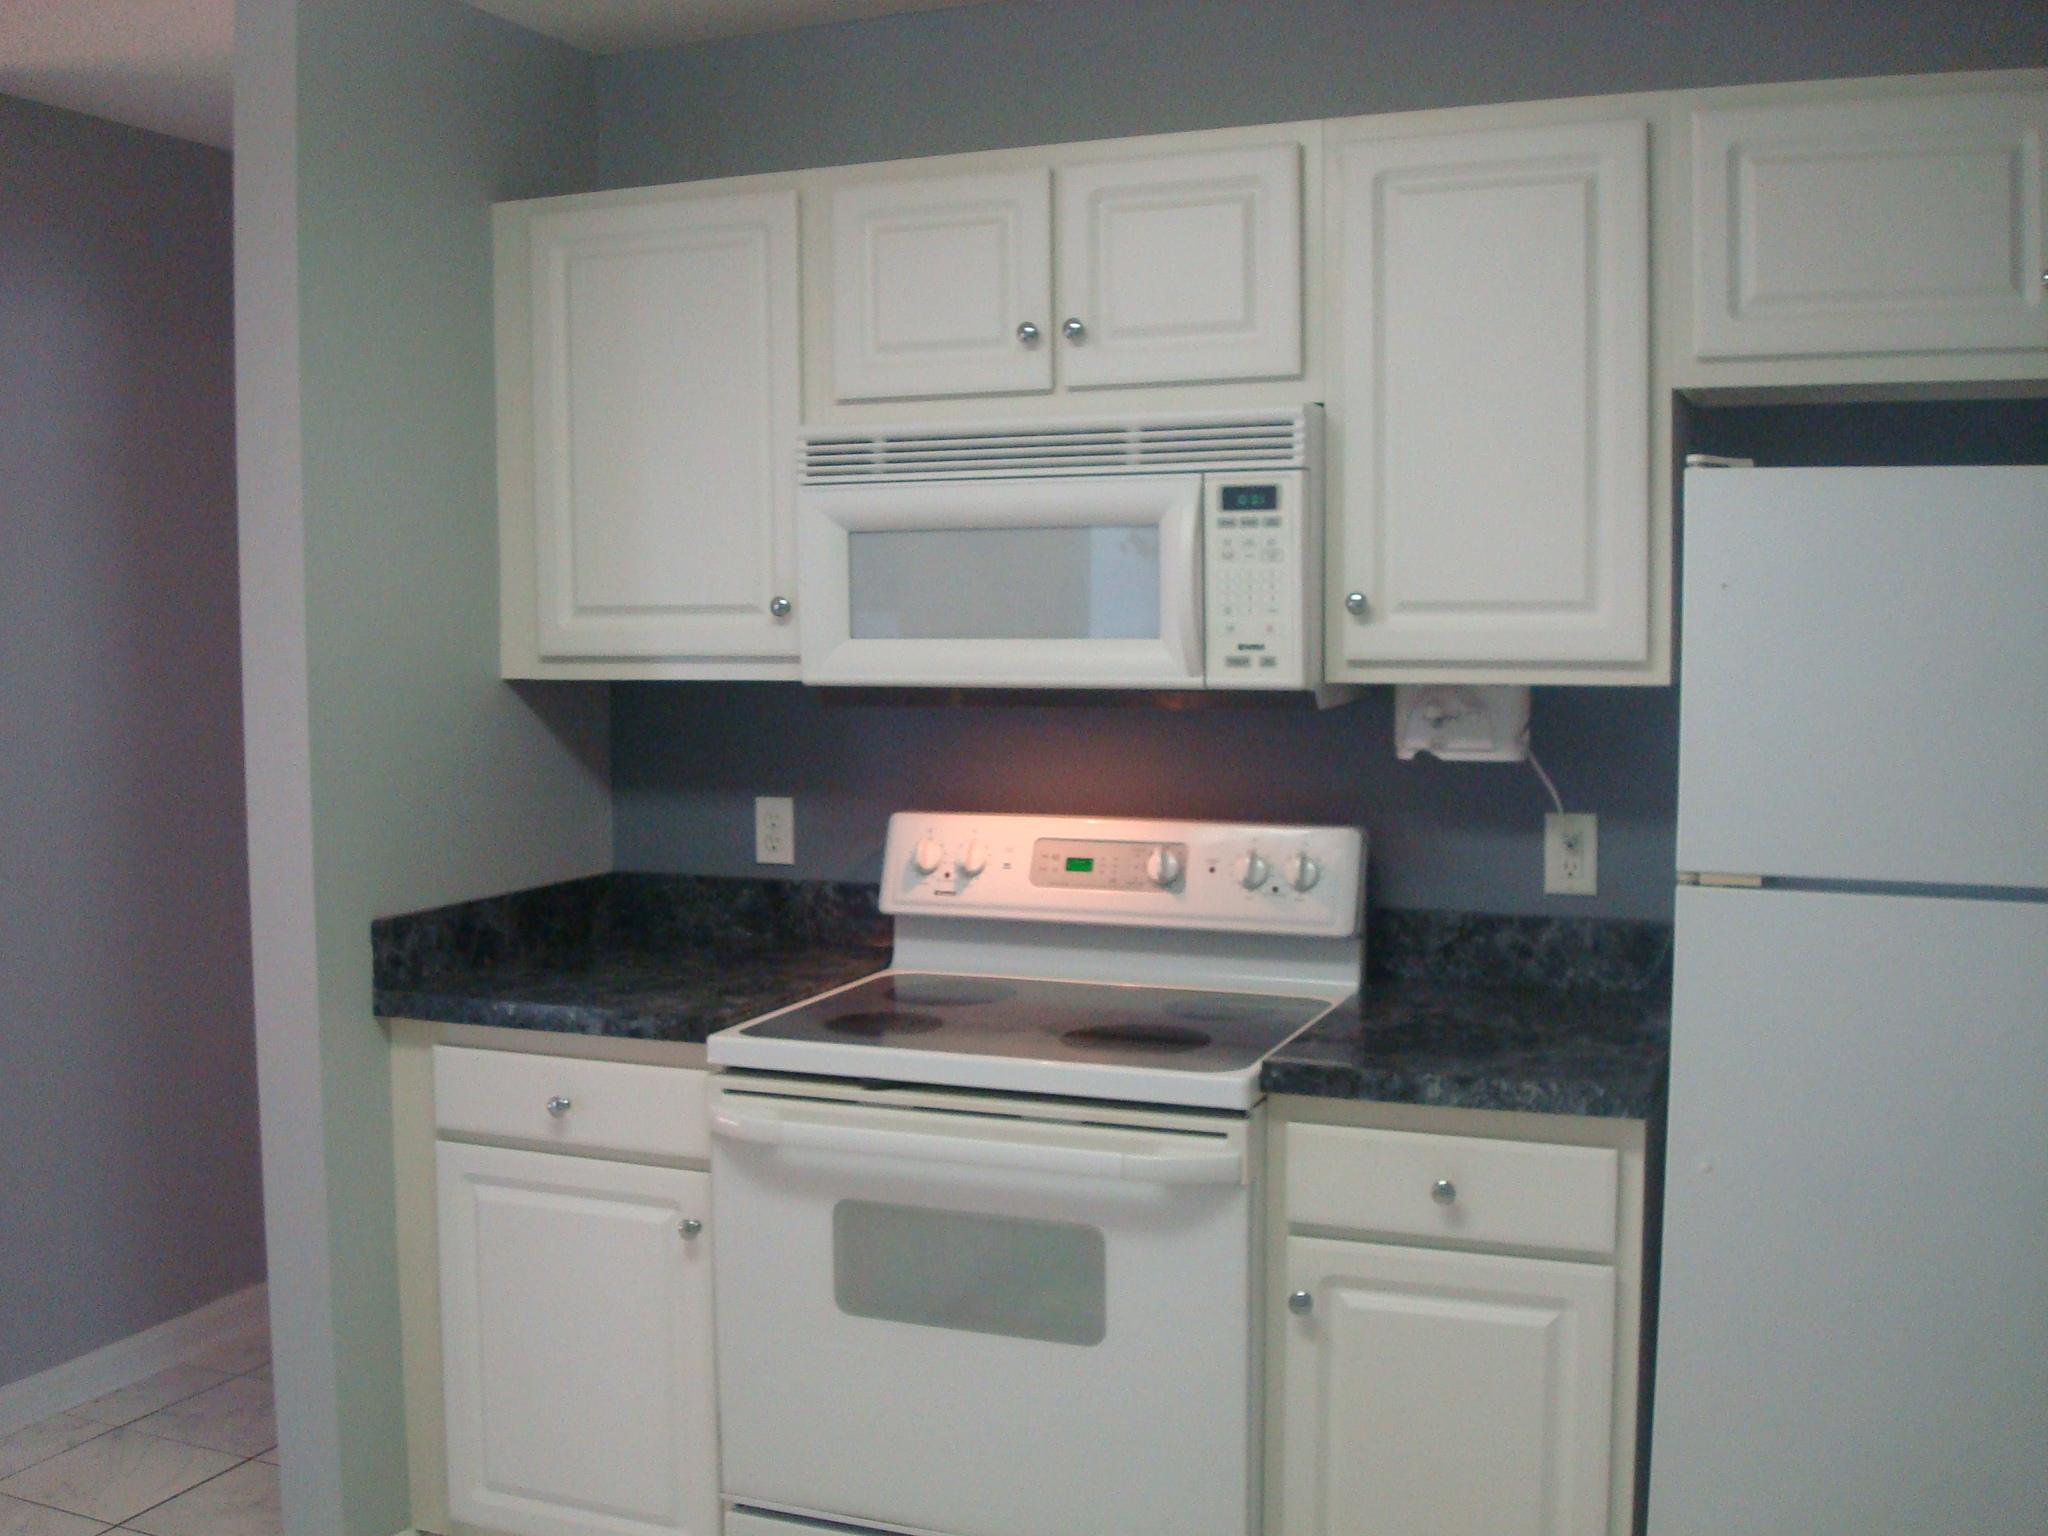 kitchen stove side.JPG